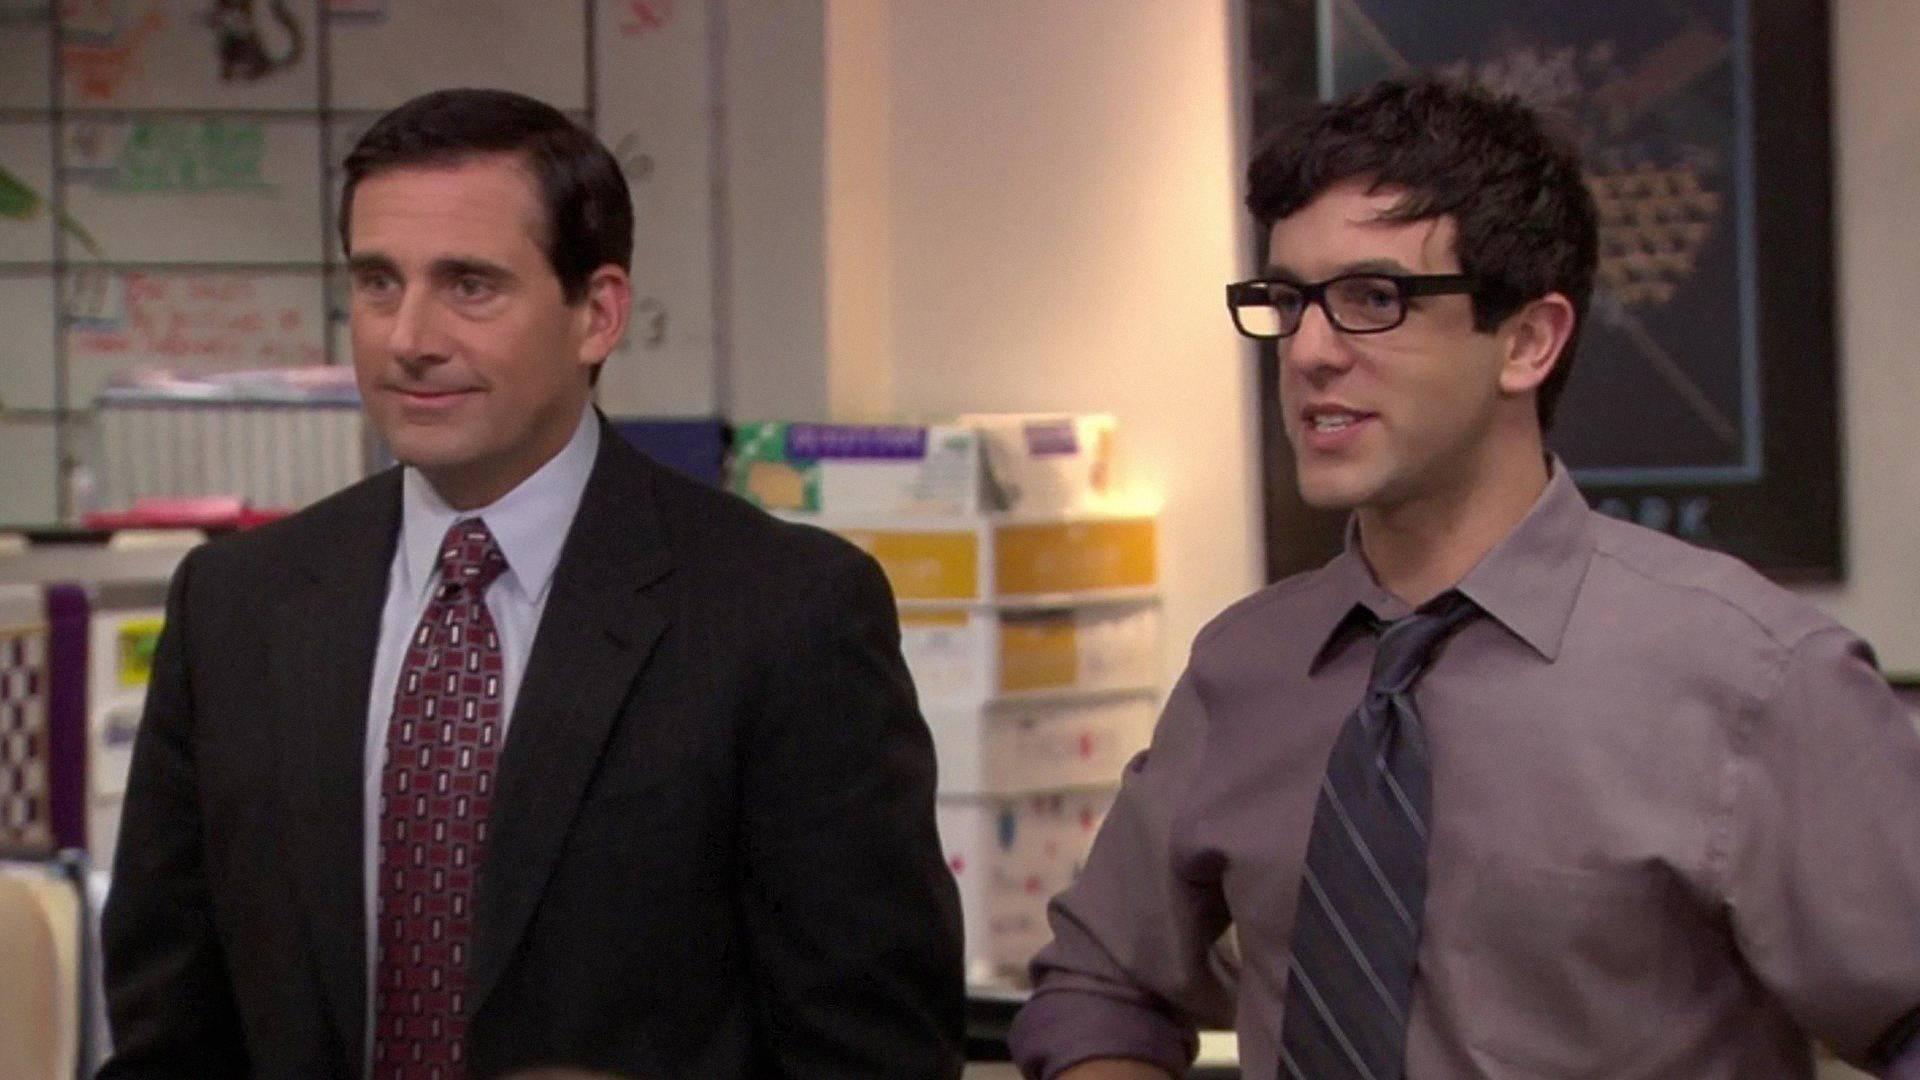 The Office Season 7 Episode 9